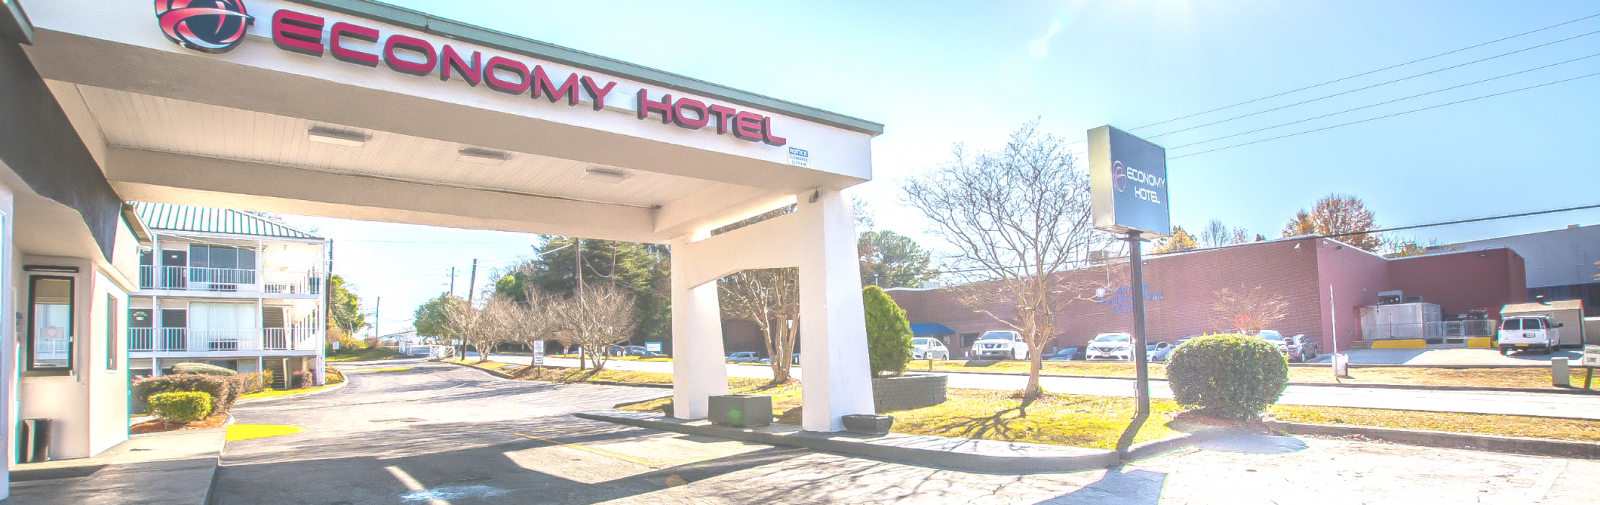 Economy Hotel Forest Park